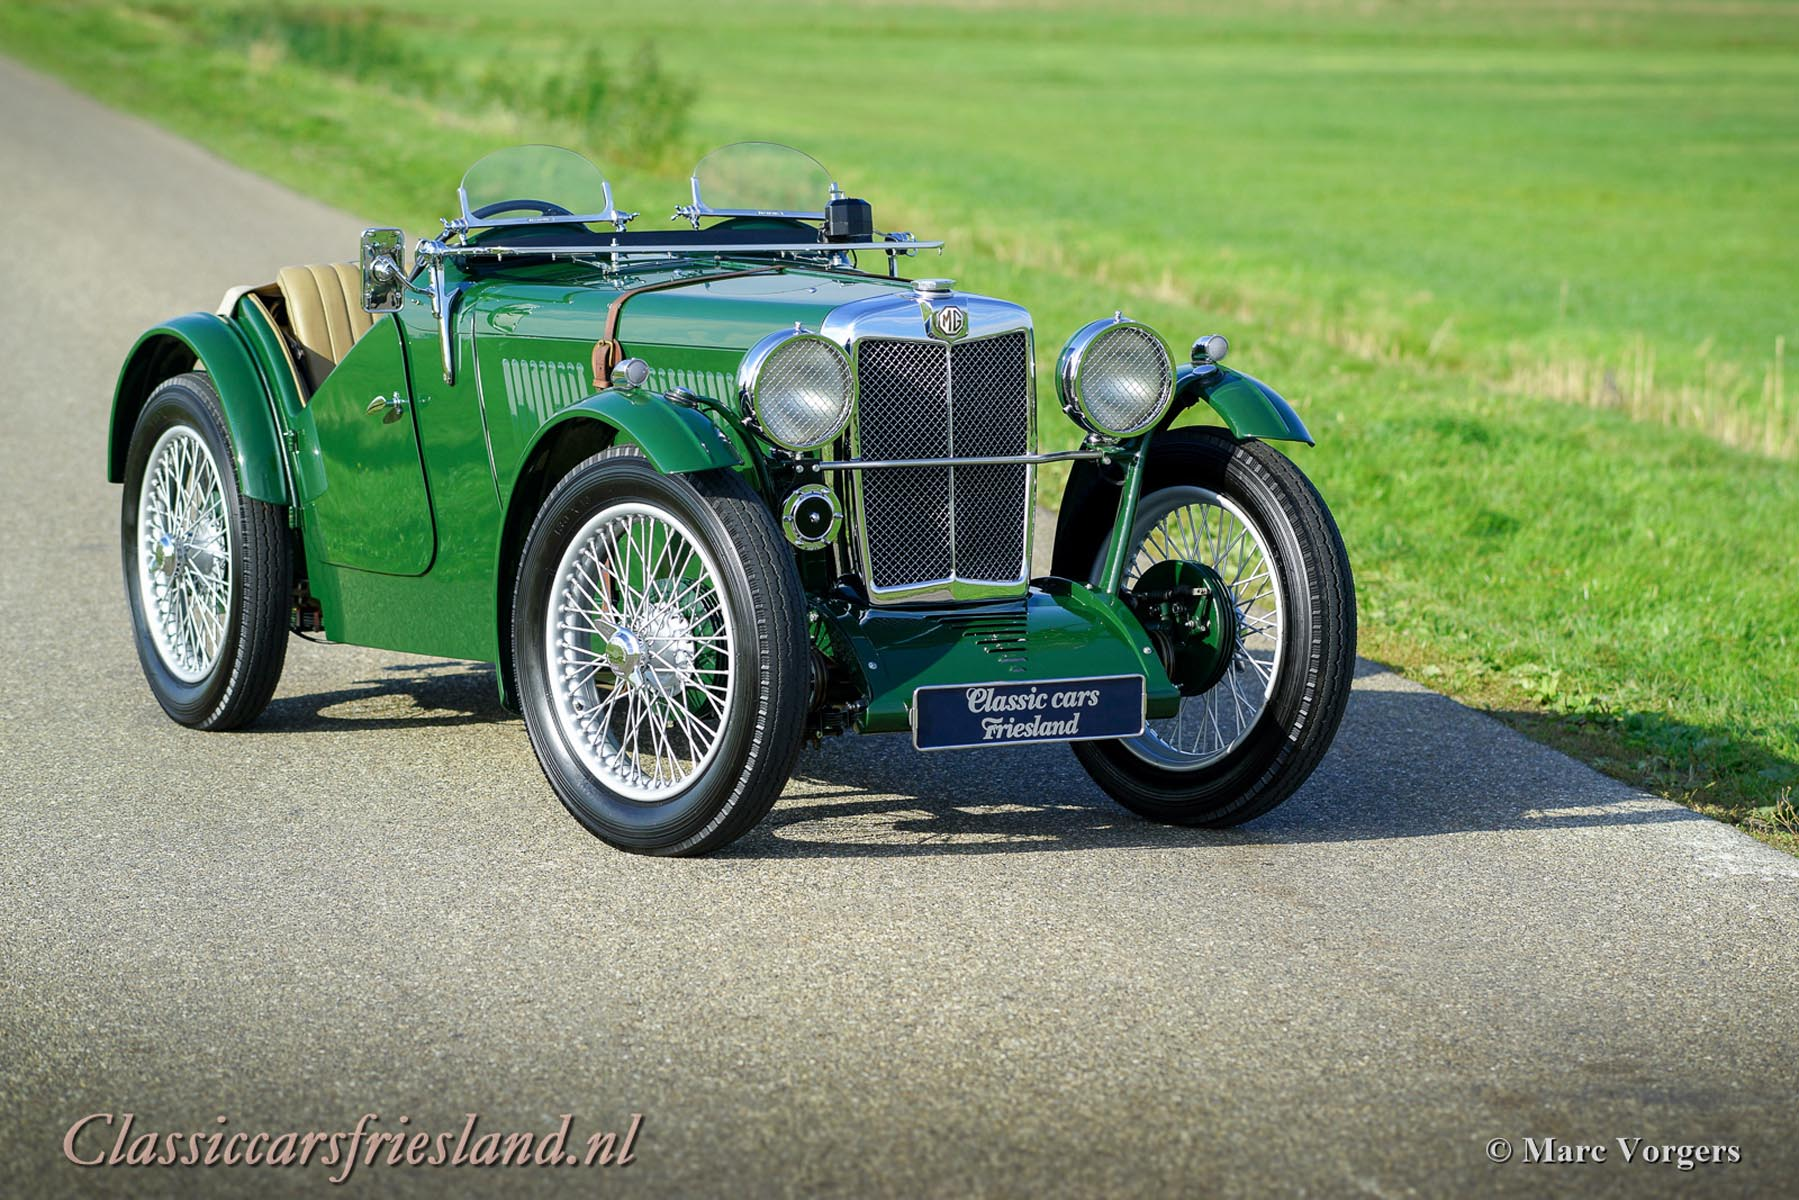 MG J2 MIDGET 1933 - Classic Cars Friesland